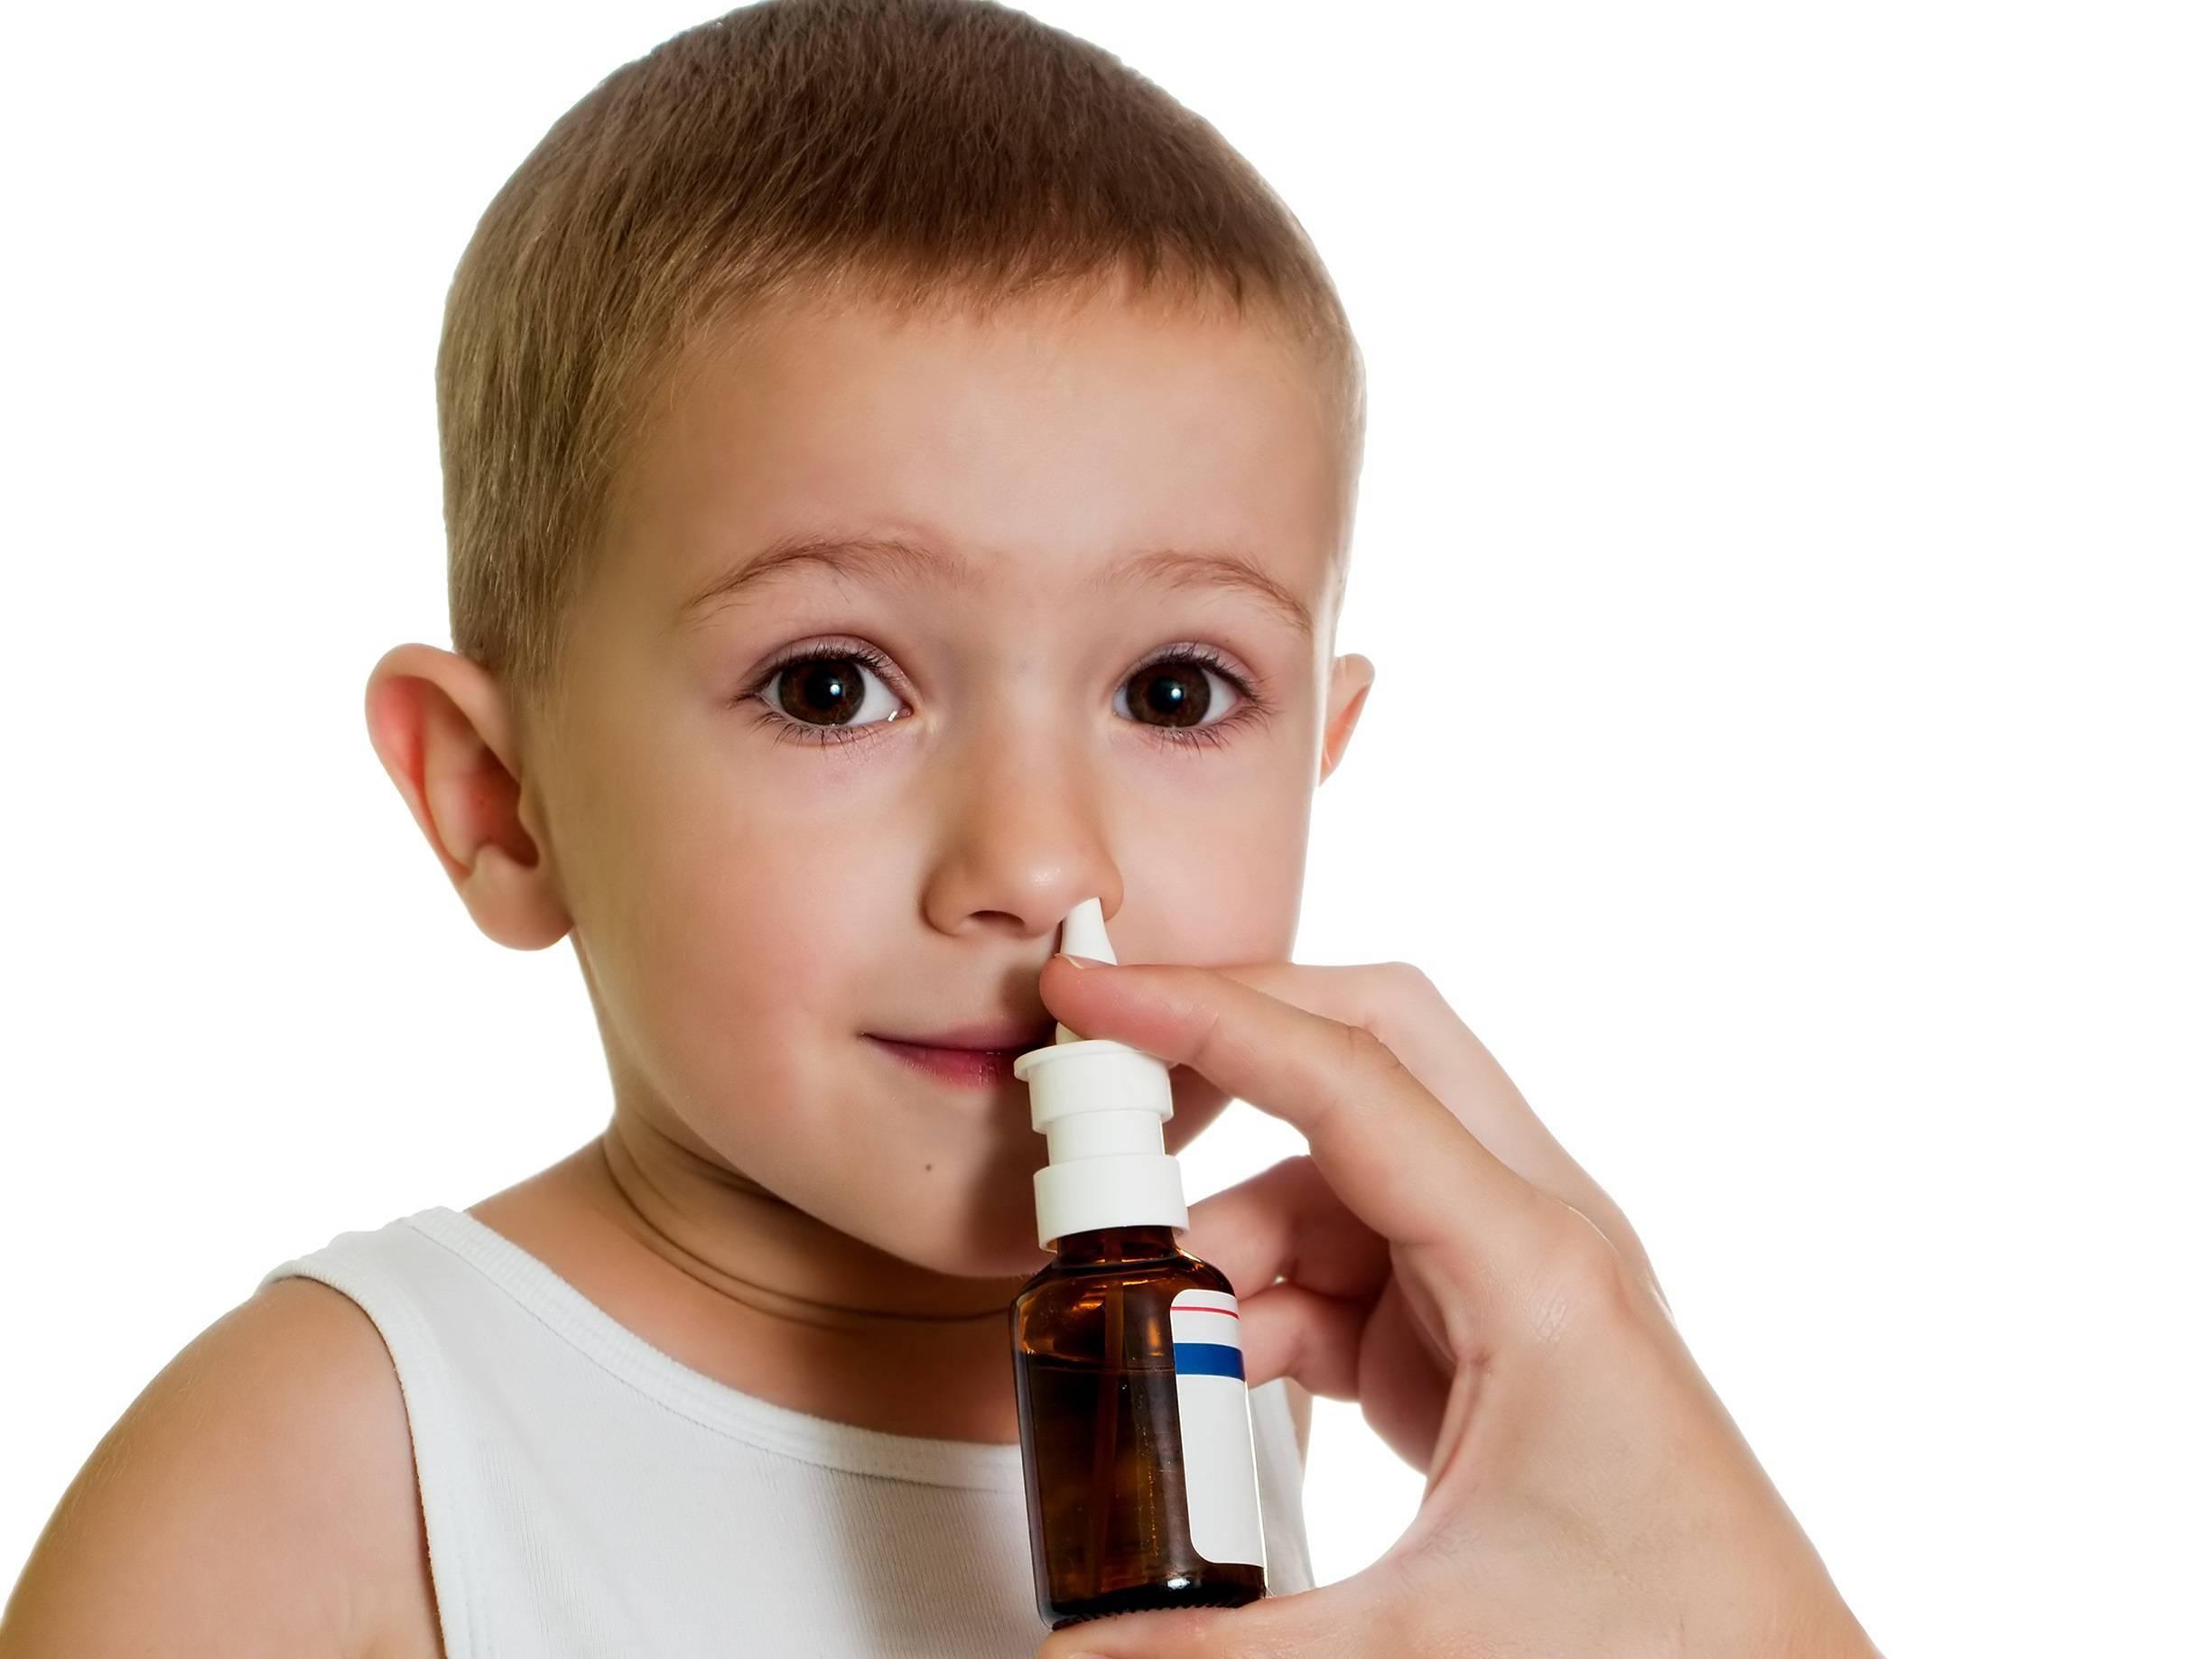 Спрей от насморка и заложенности носа для детей от года